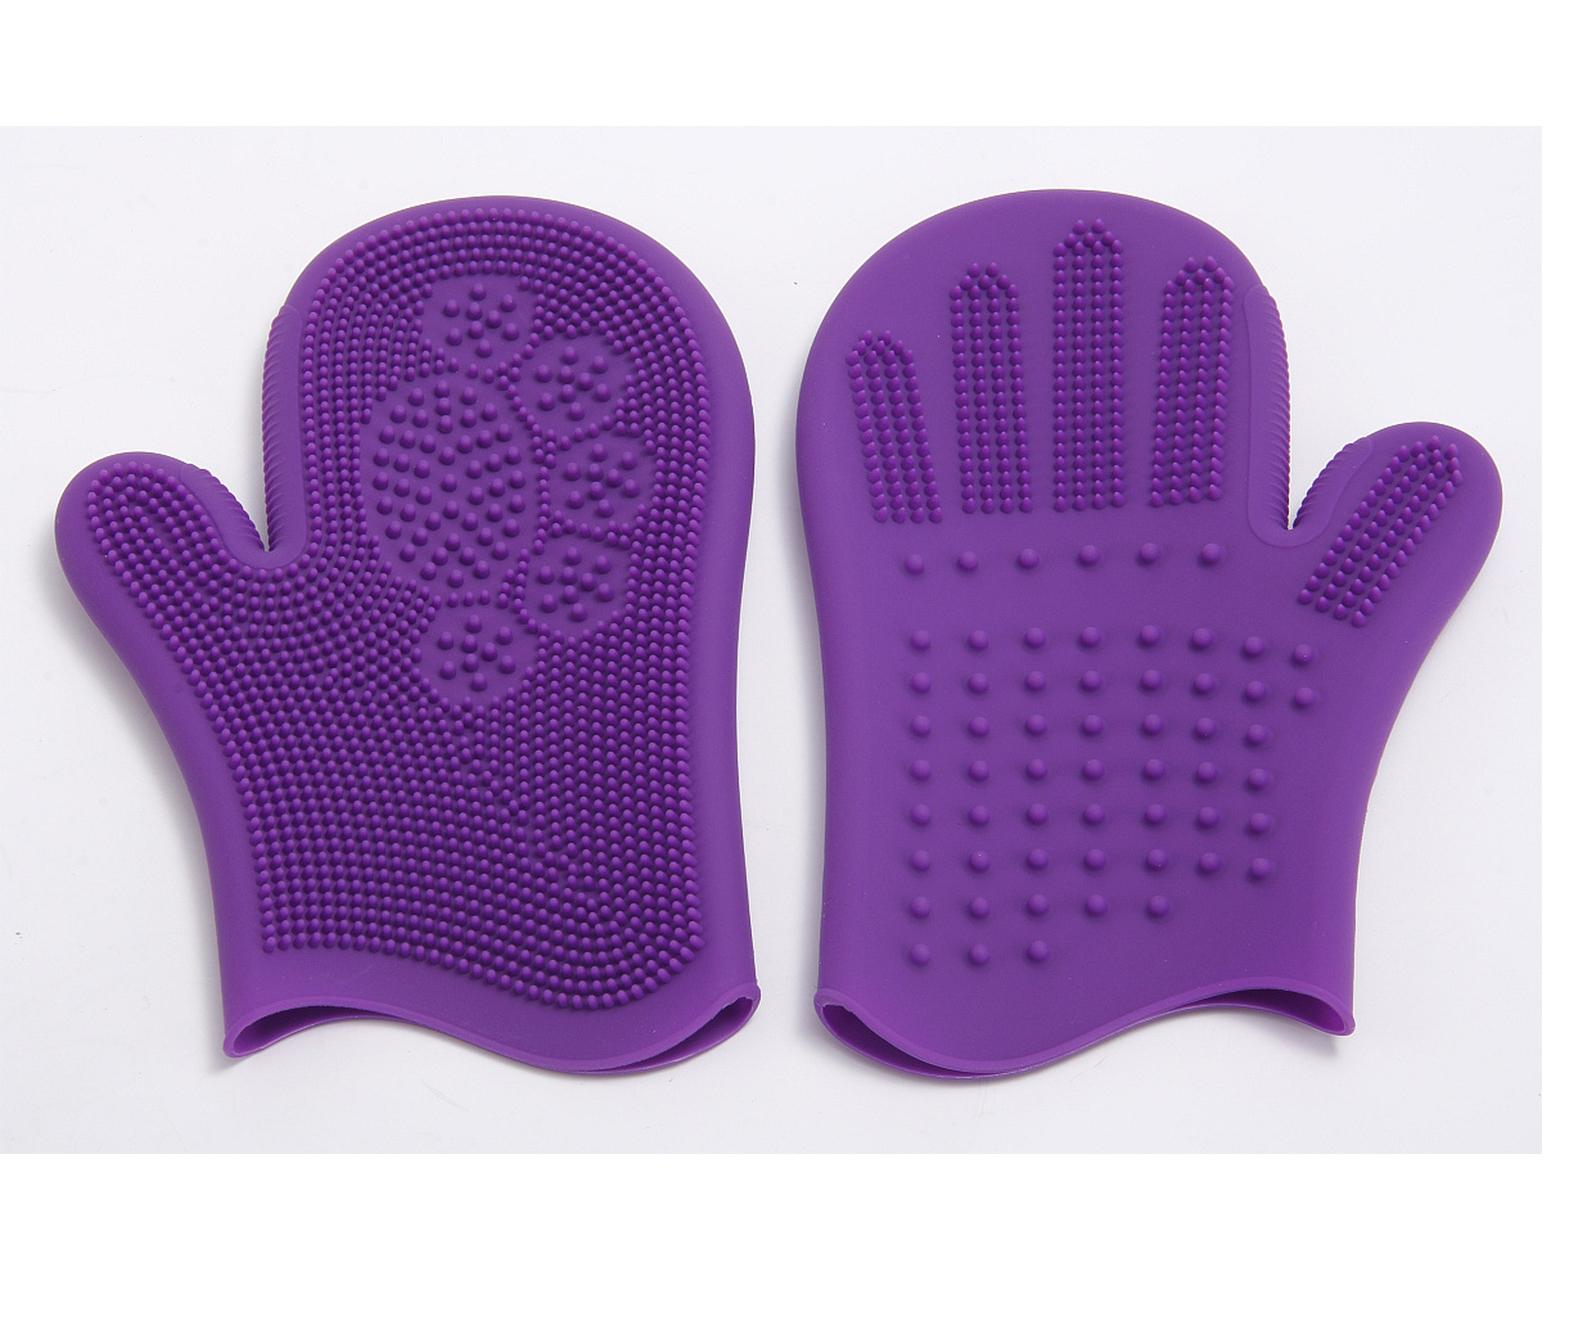 silicona de aseo de mascotas guantes para mascotas perros y gatos de baño novio impermeable para mascotas guantes de limpieza